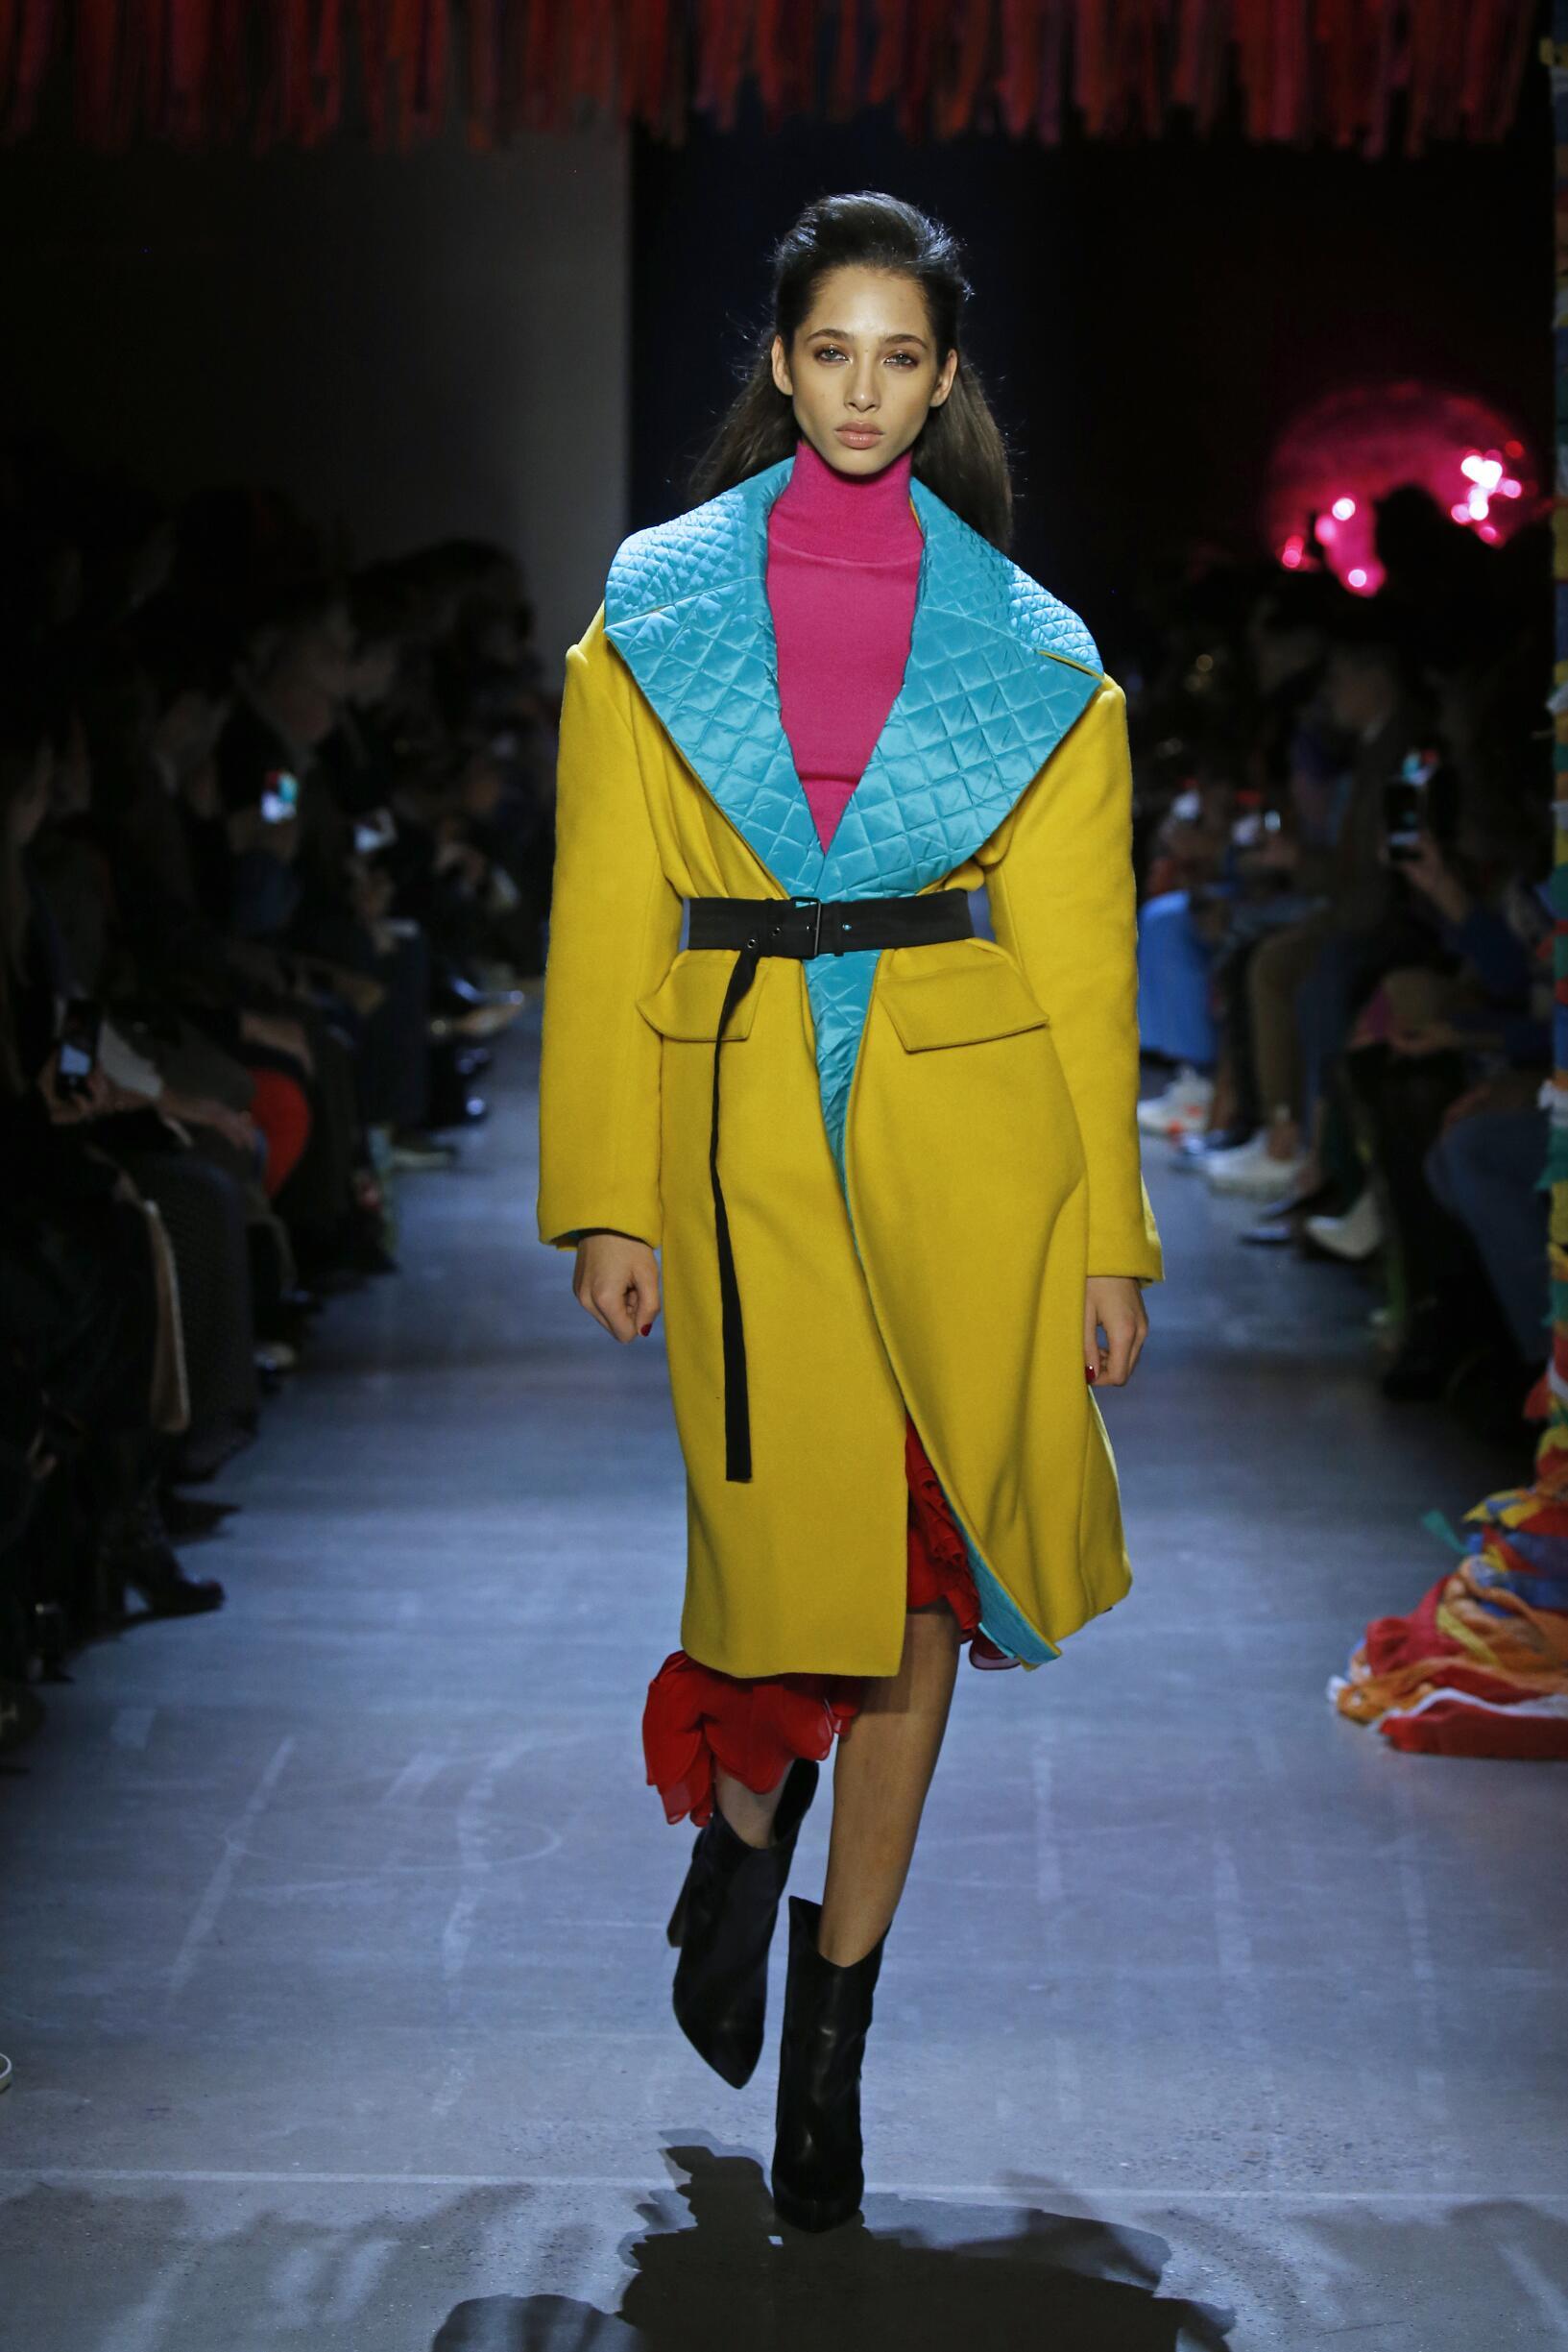 FW 2019-20 Fashion Show Prabal Gurung